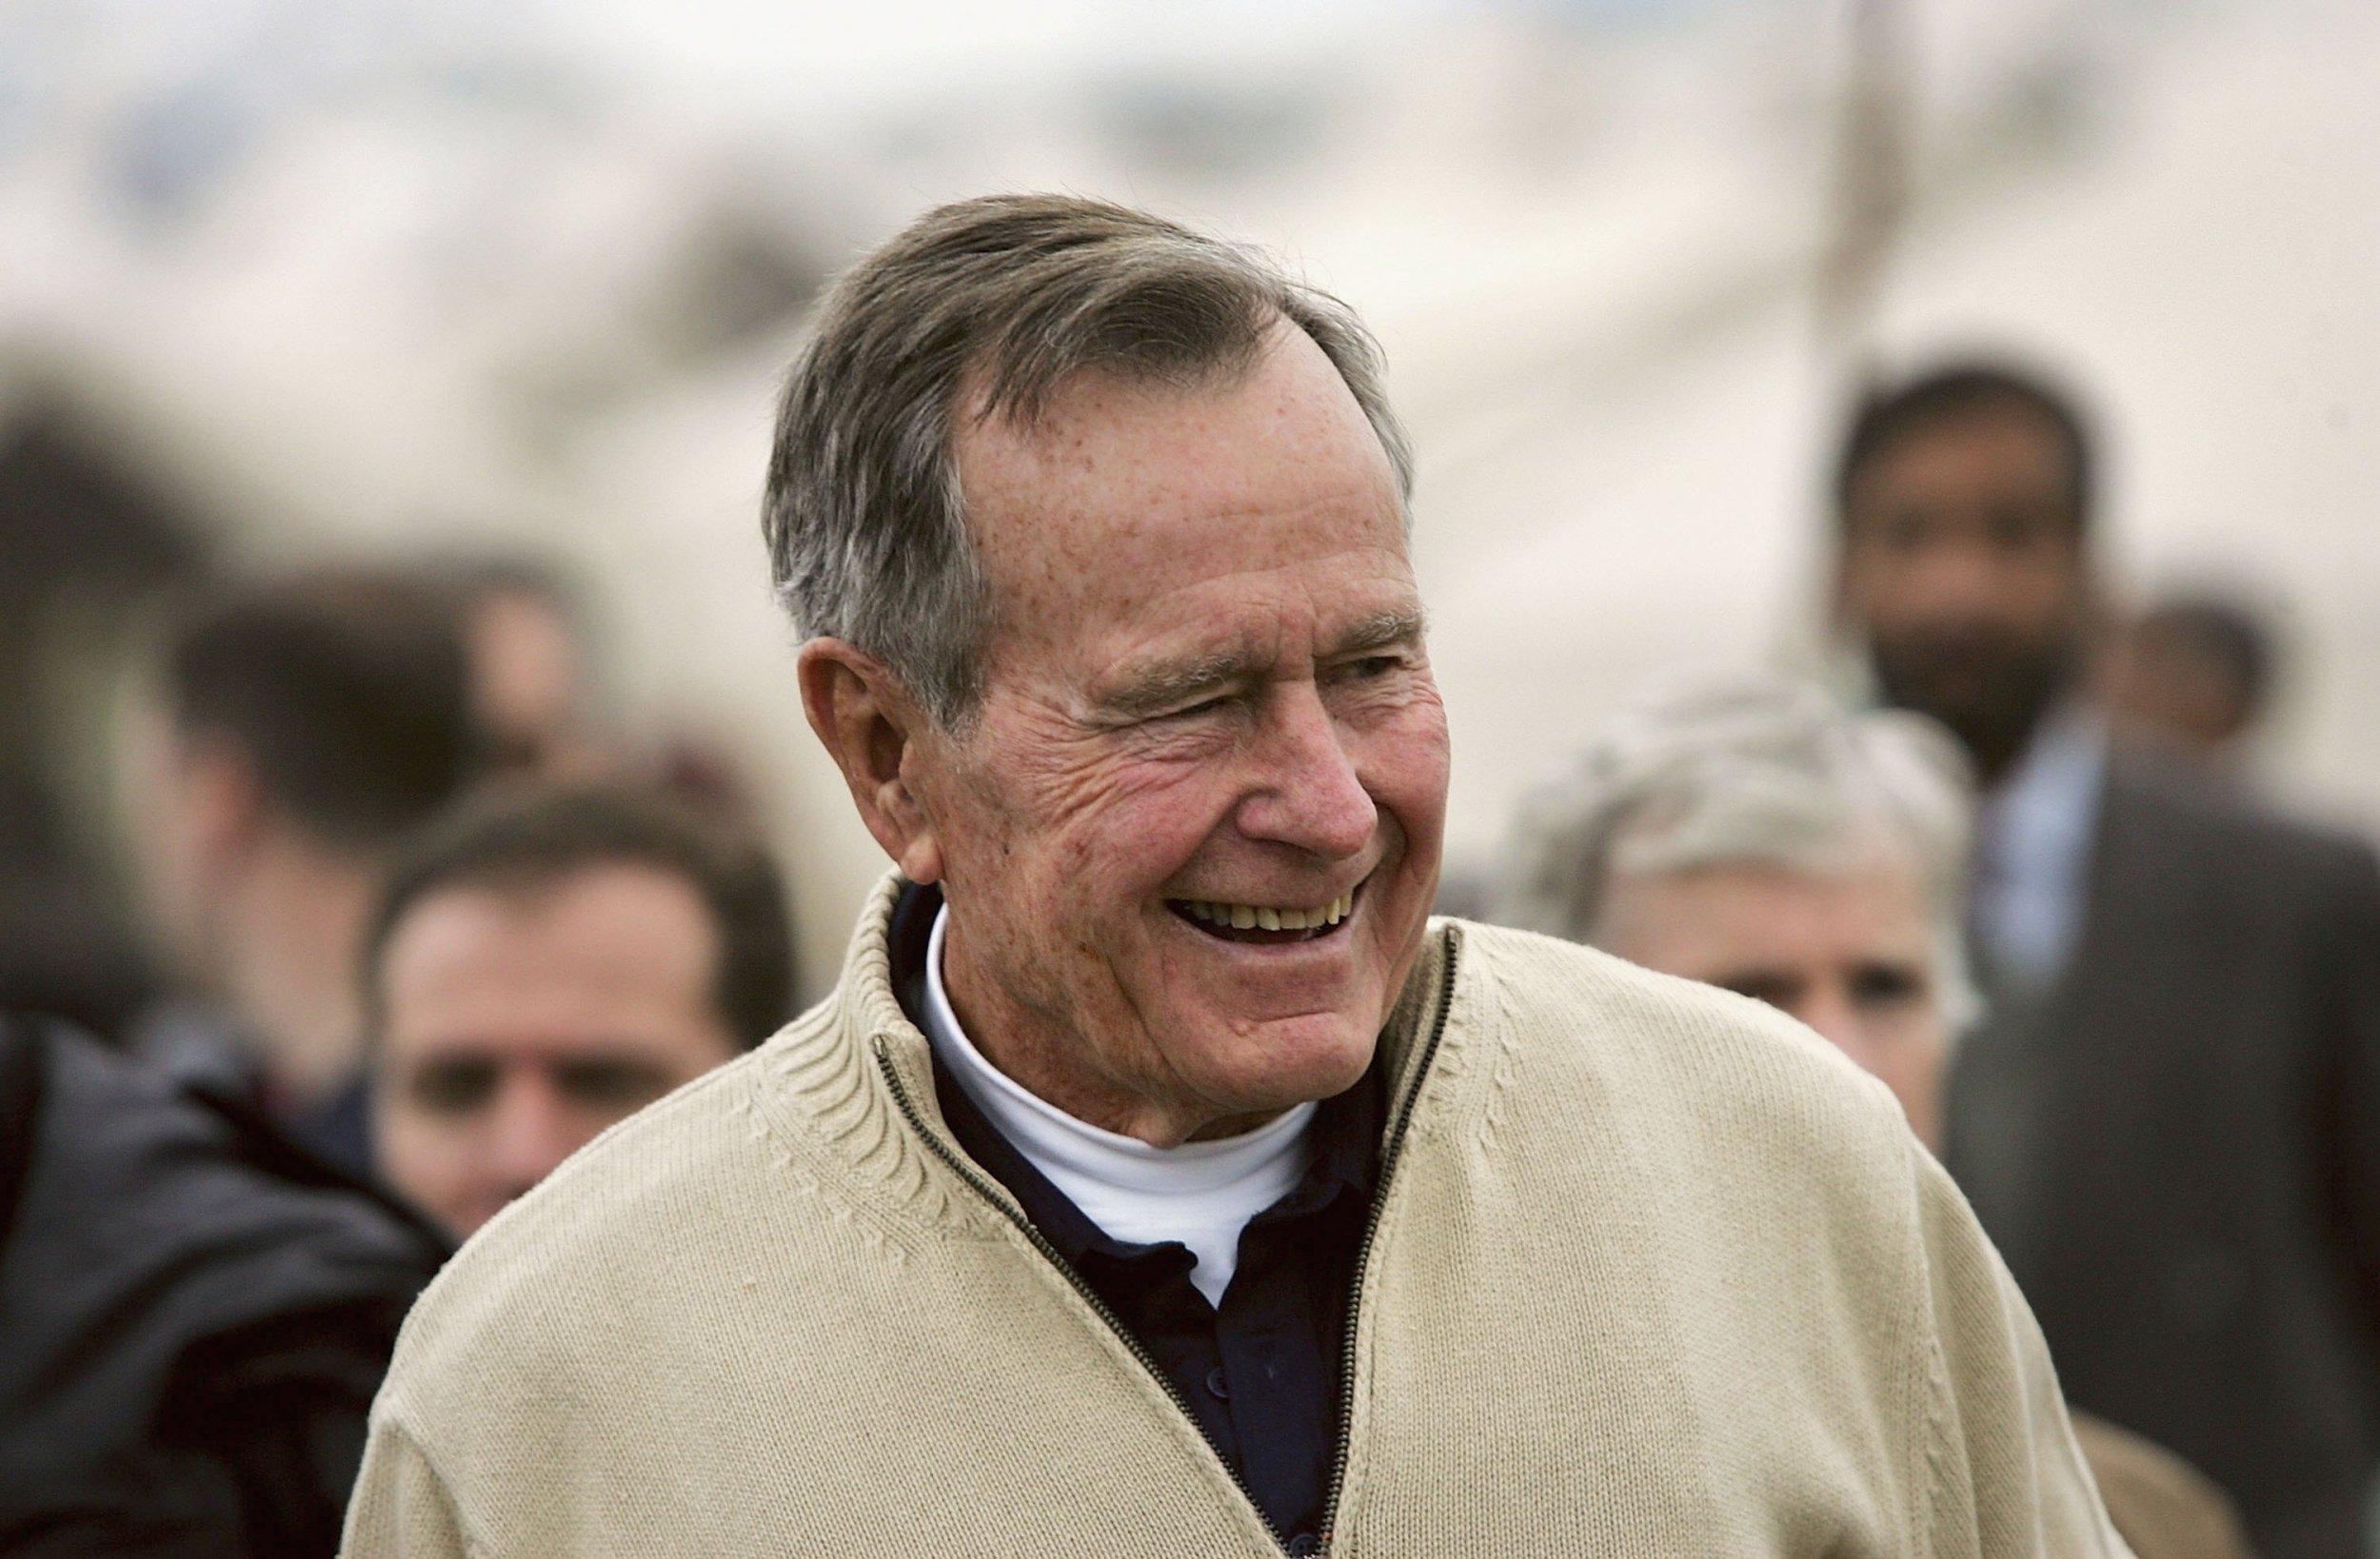 Bush-Senior-Kinder-Gentler-Approach-Civility-56603784